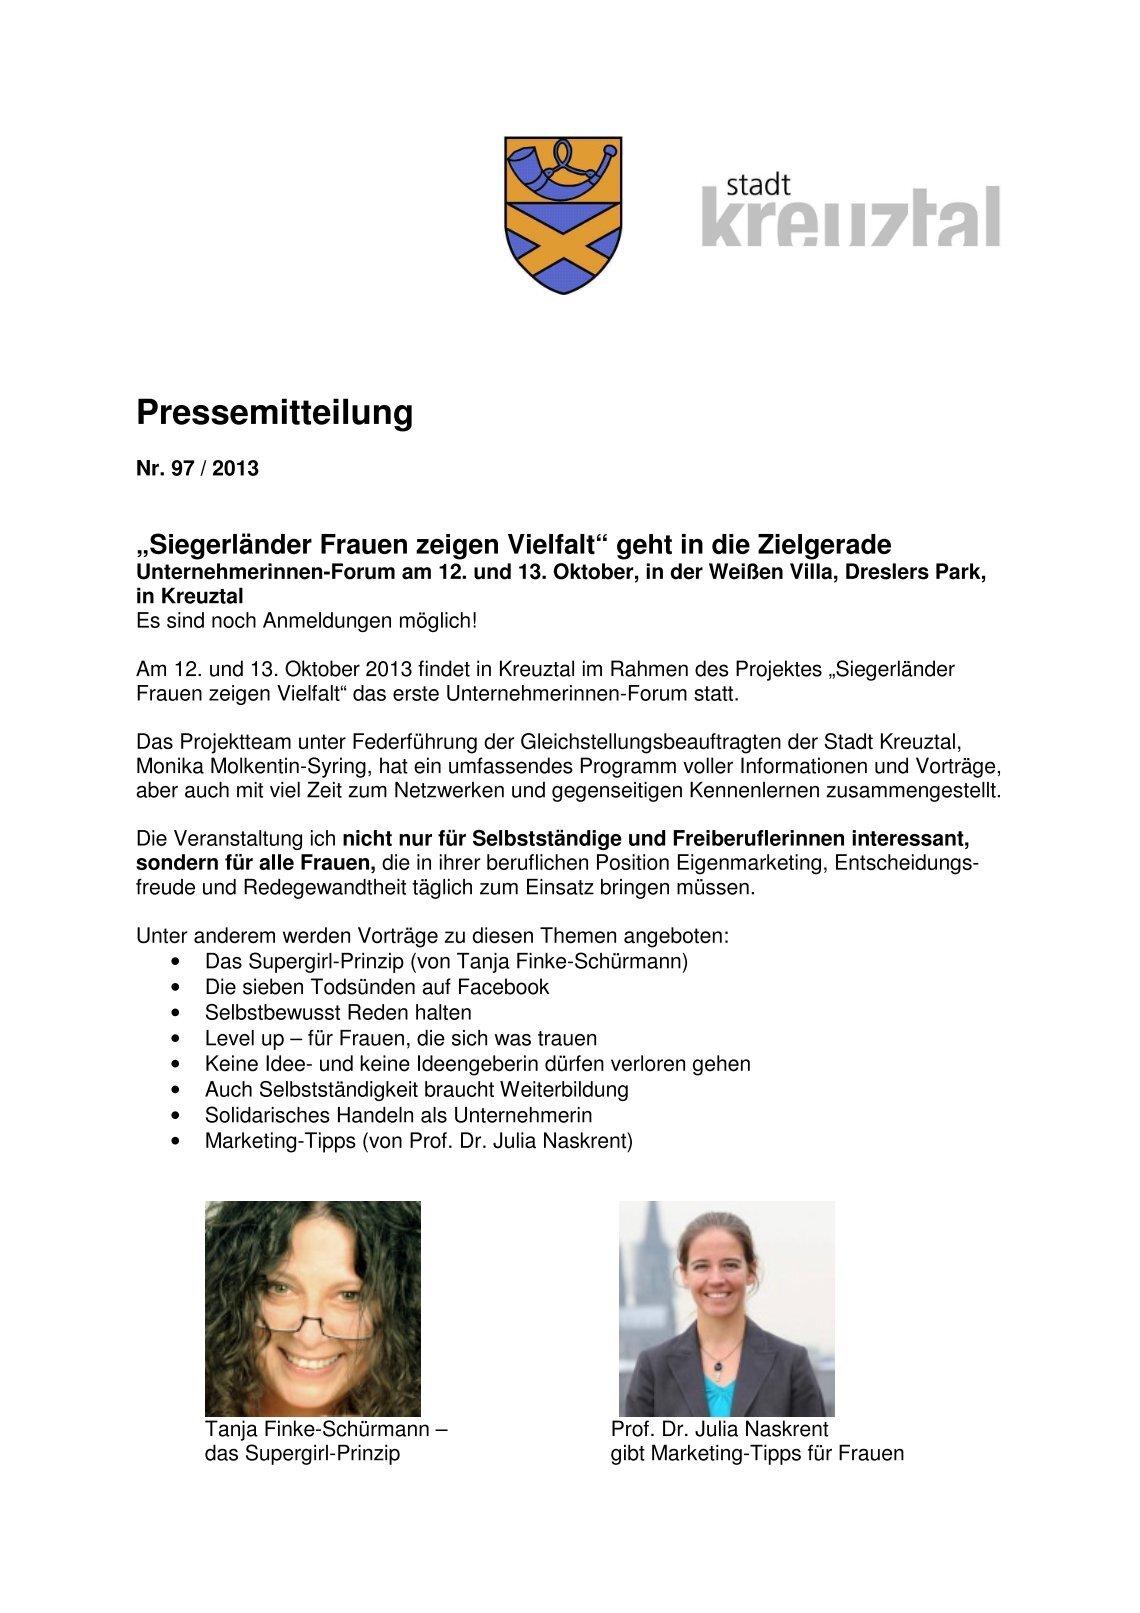 possible tell, Partnersuche Zittau finde deinen Traumpartner doesn't matter! can recommend